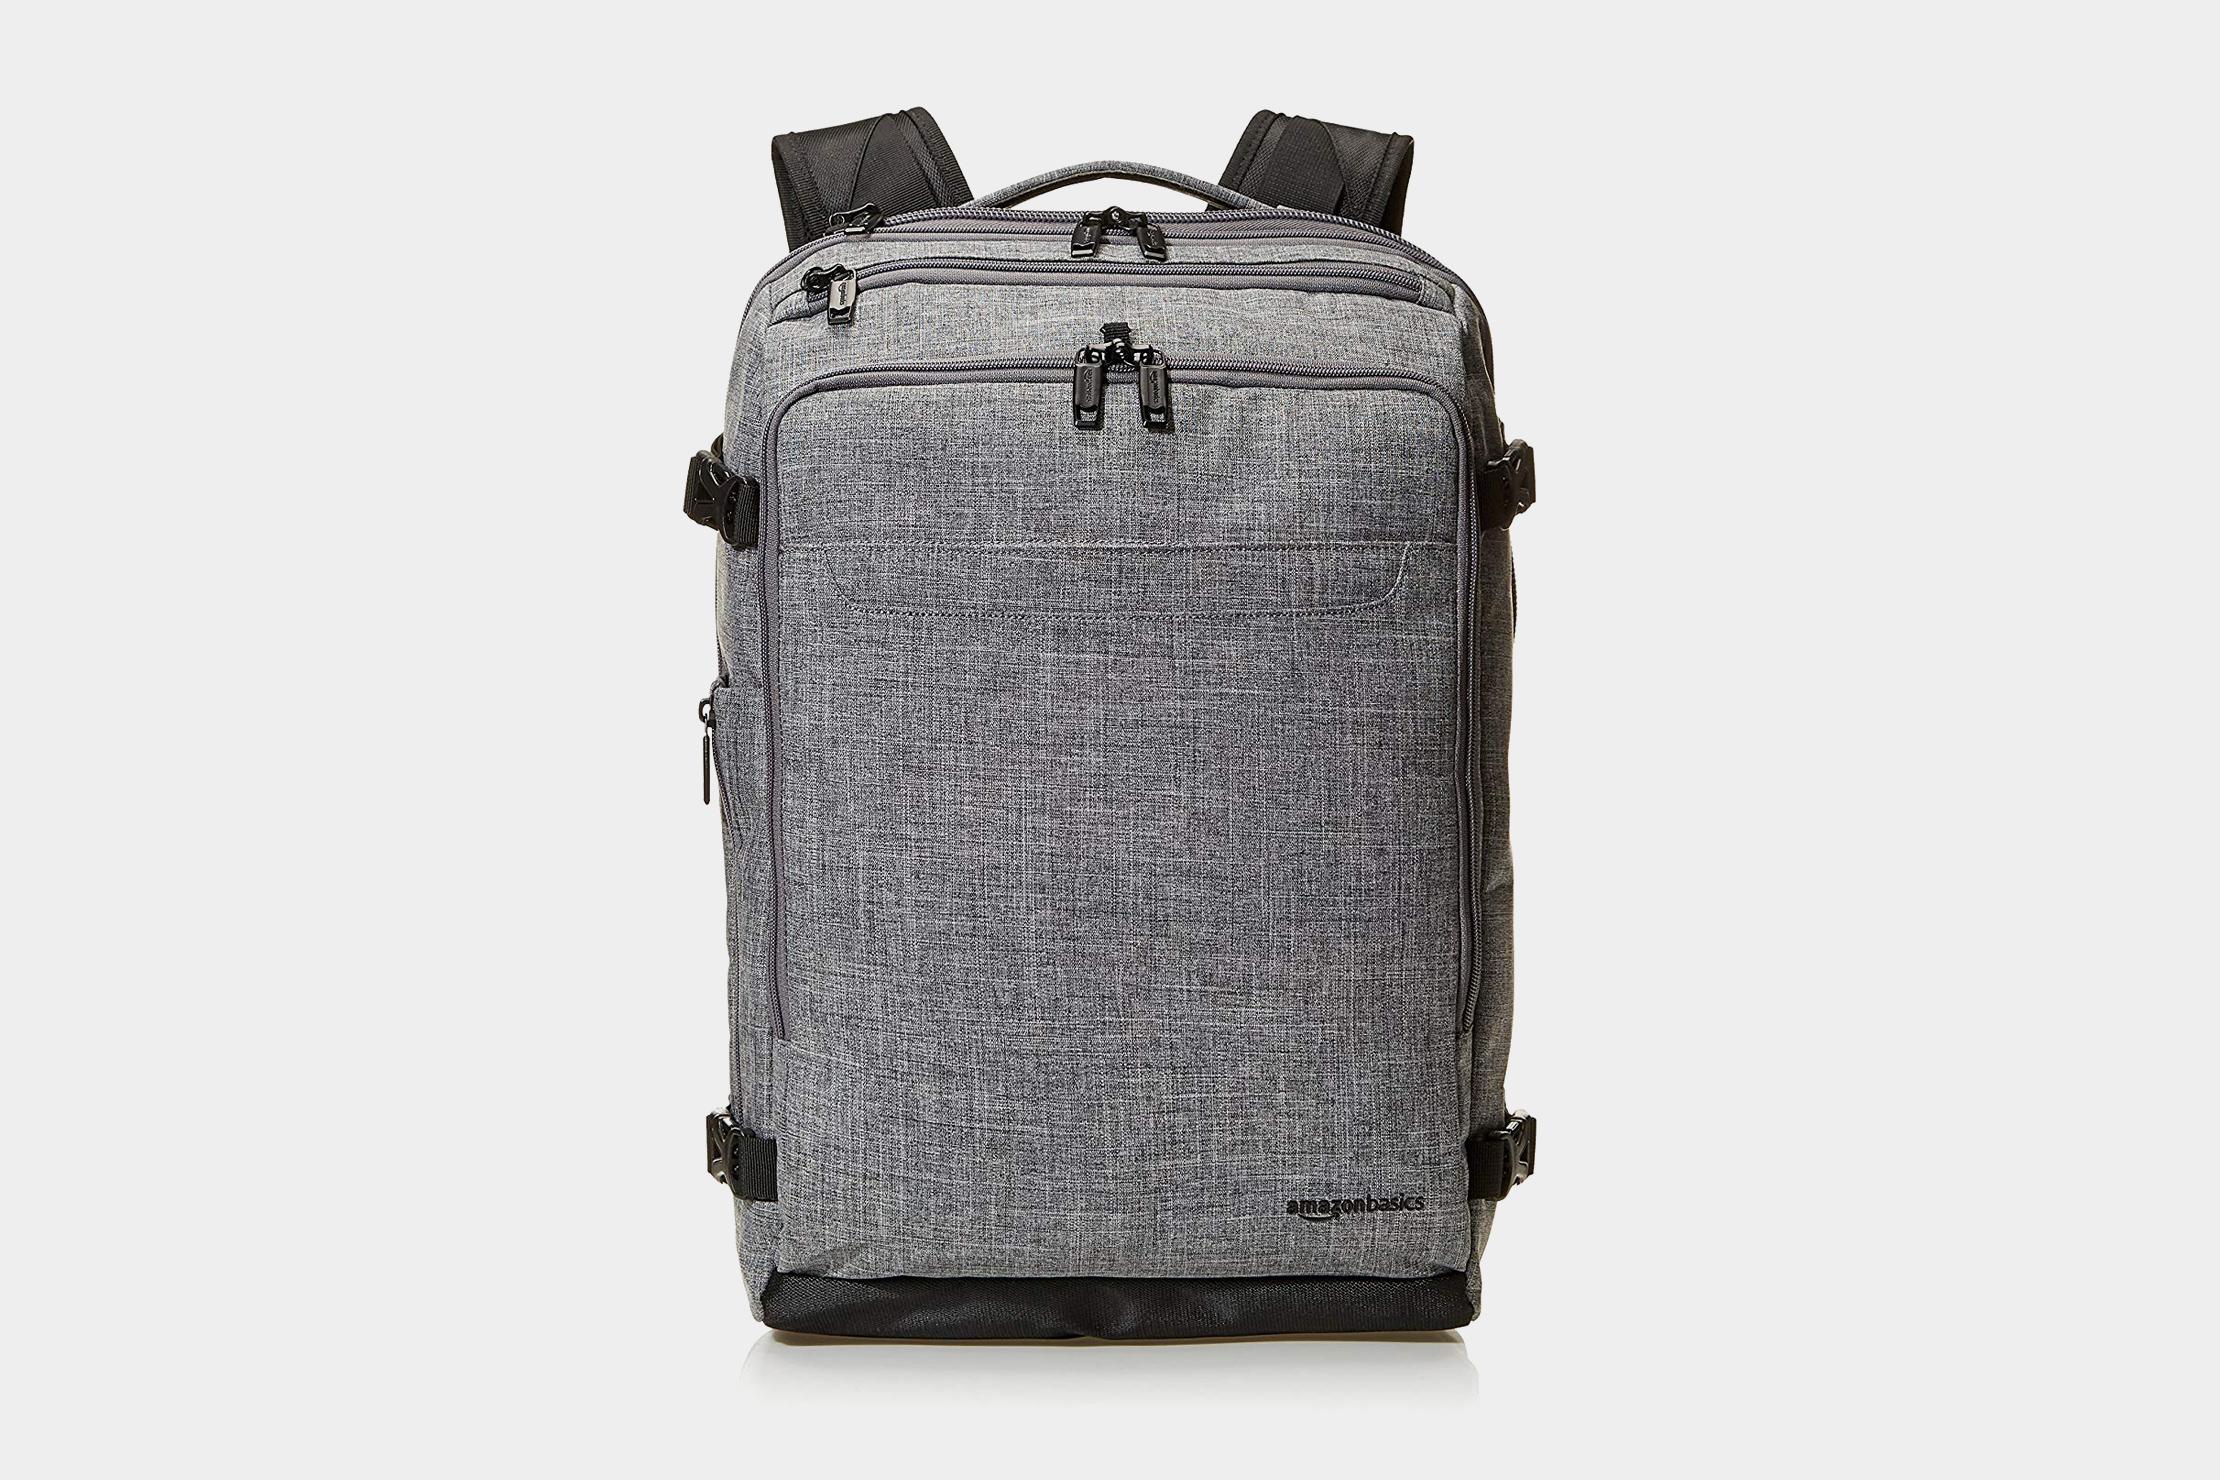 Petit EDC Carry Sling Pack pour CCW